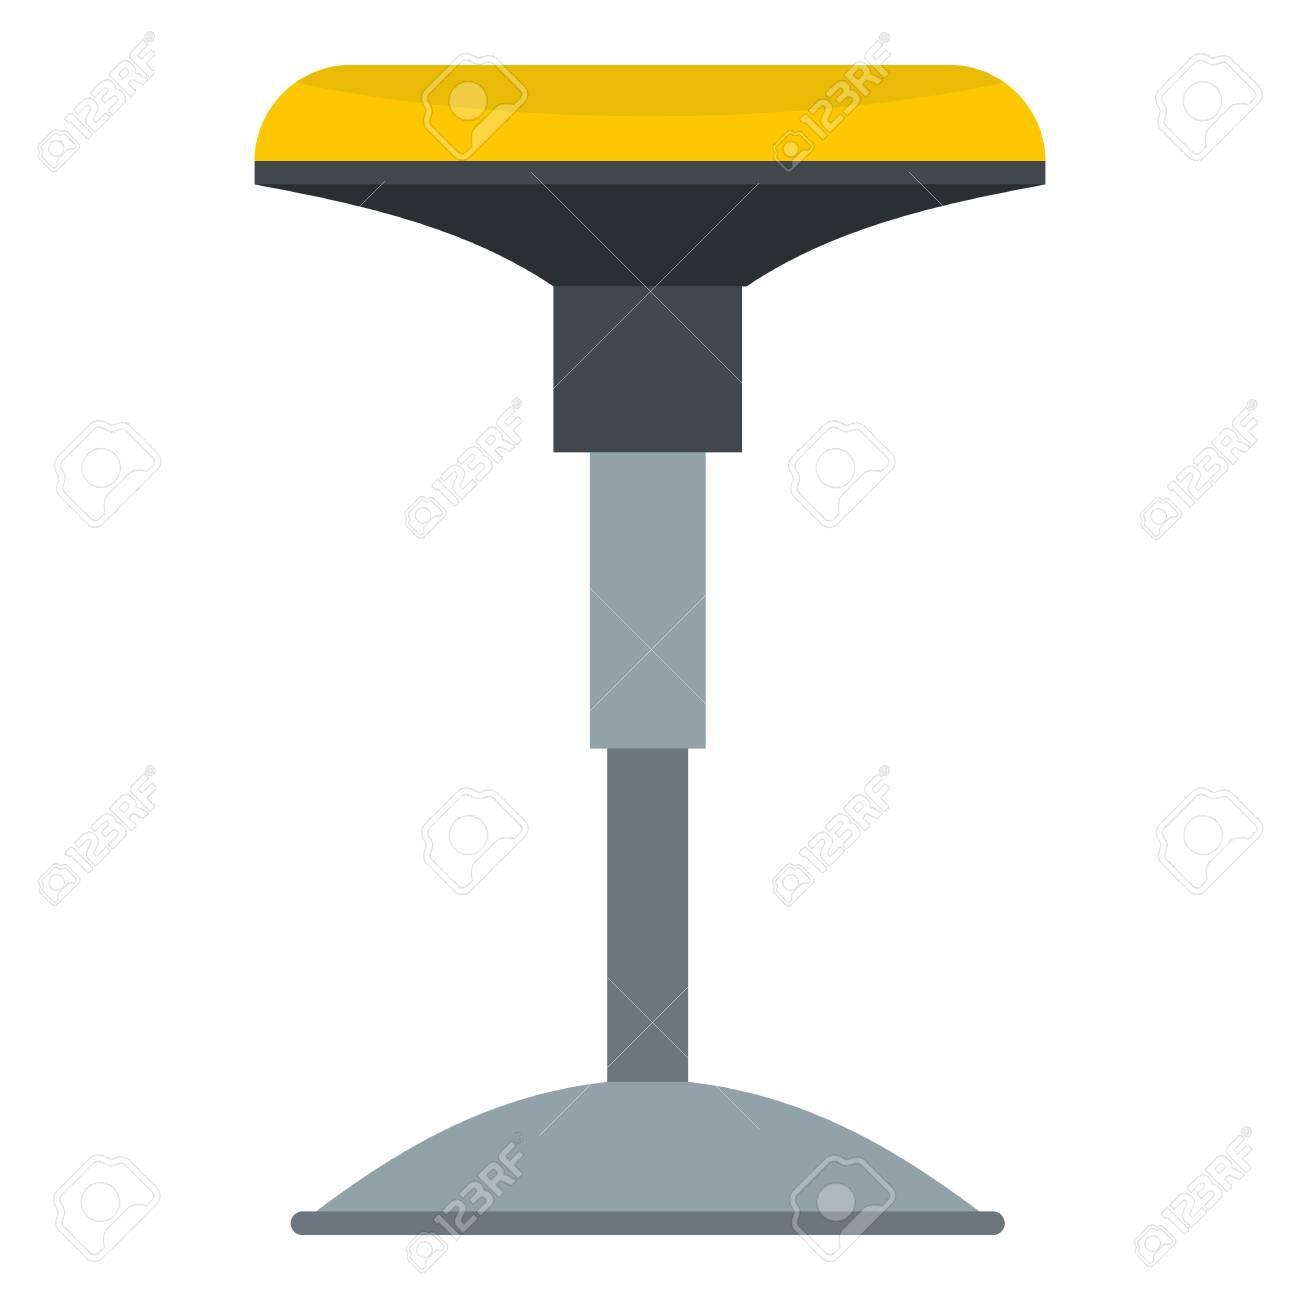 Icône de tabouret de bar jaune isolé